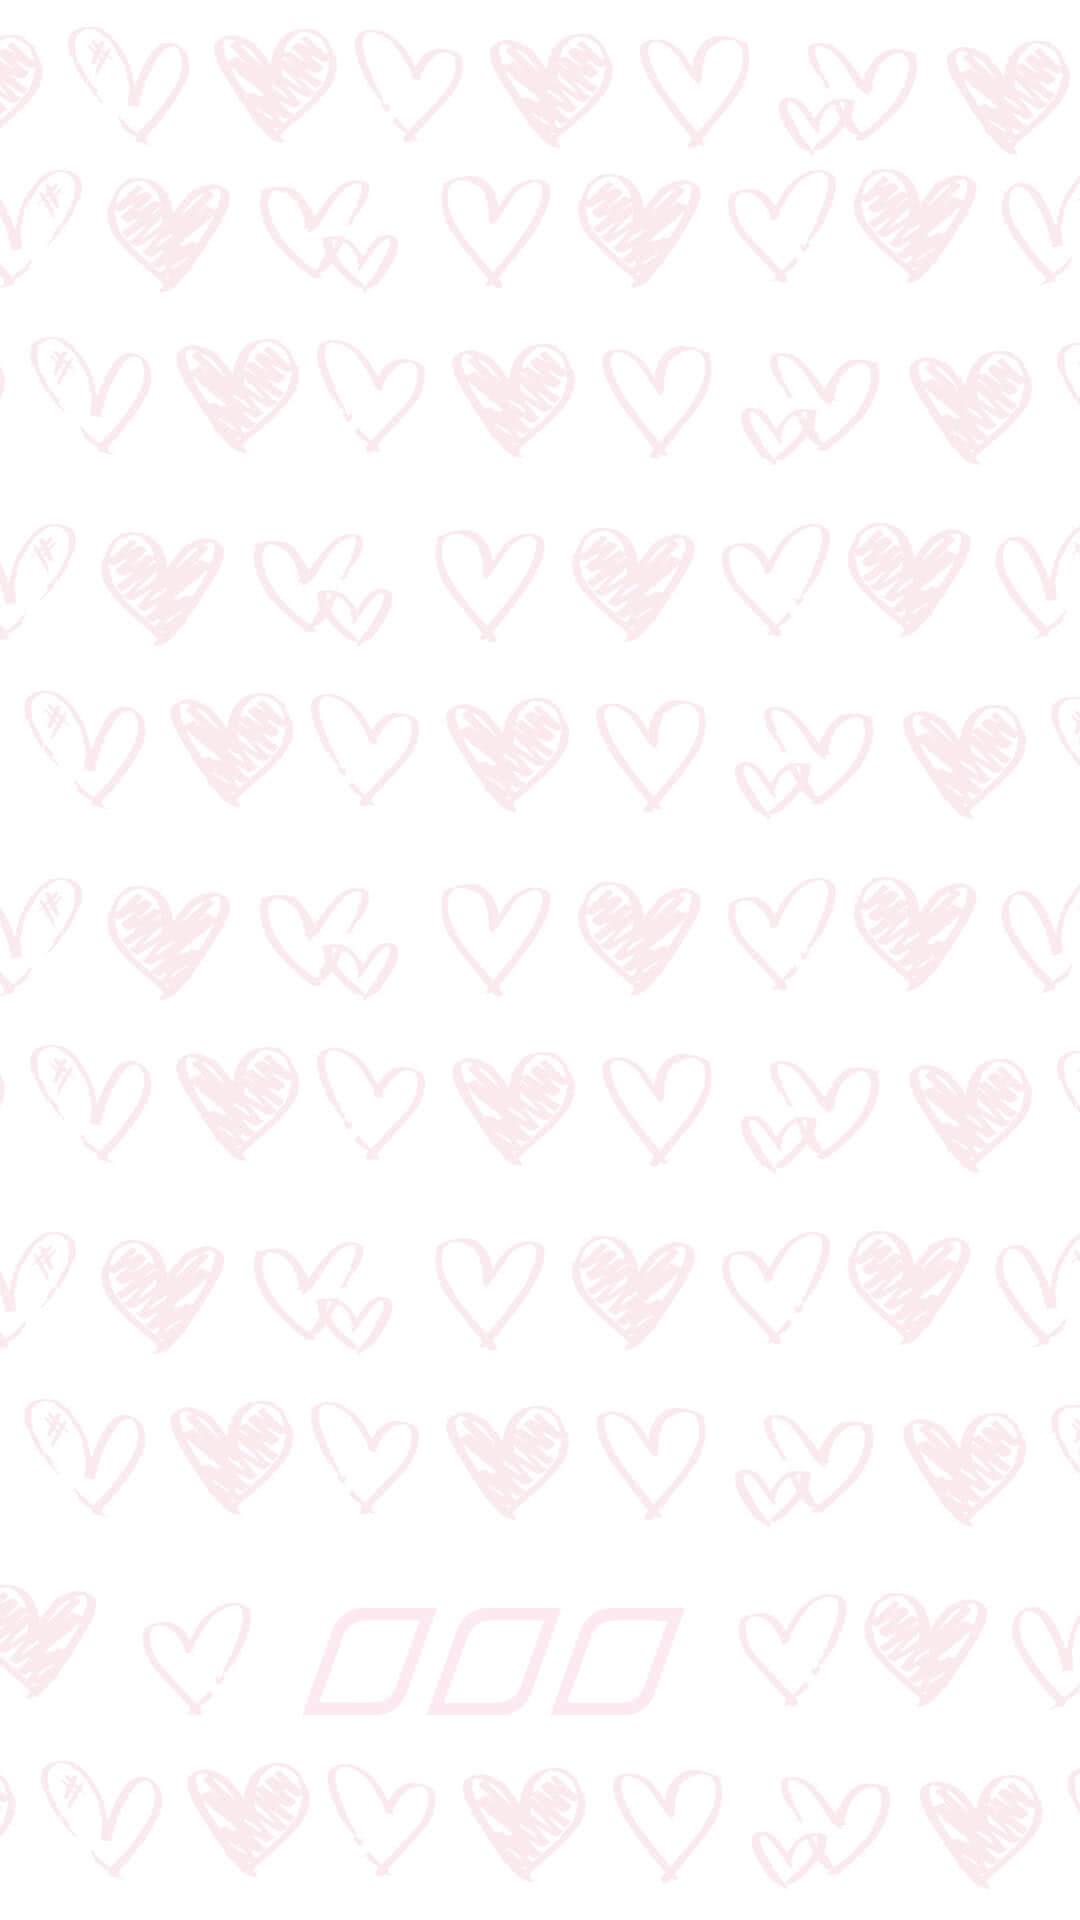 Pastel pink heart pattern